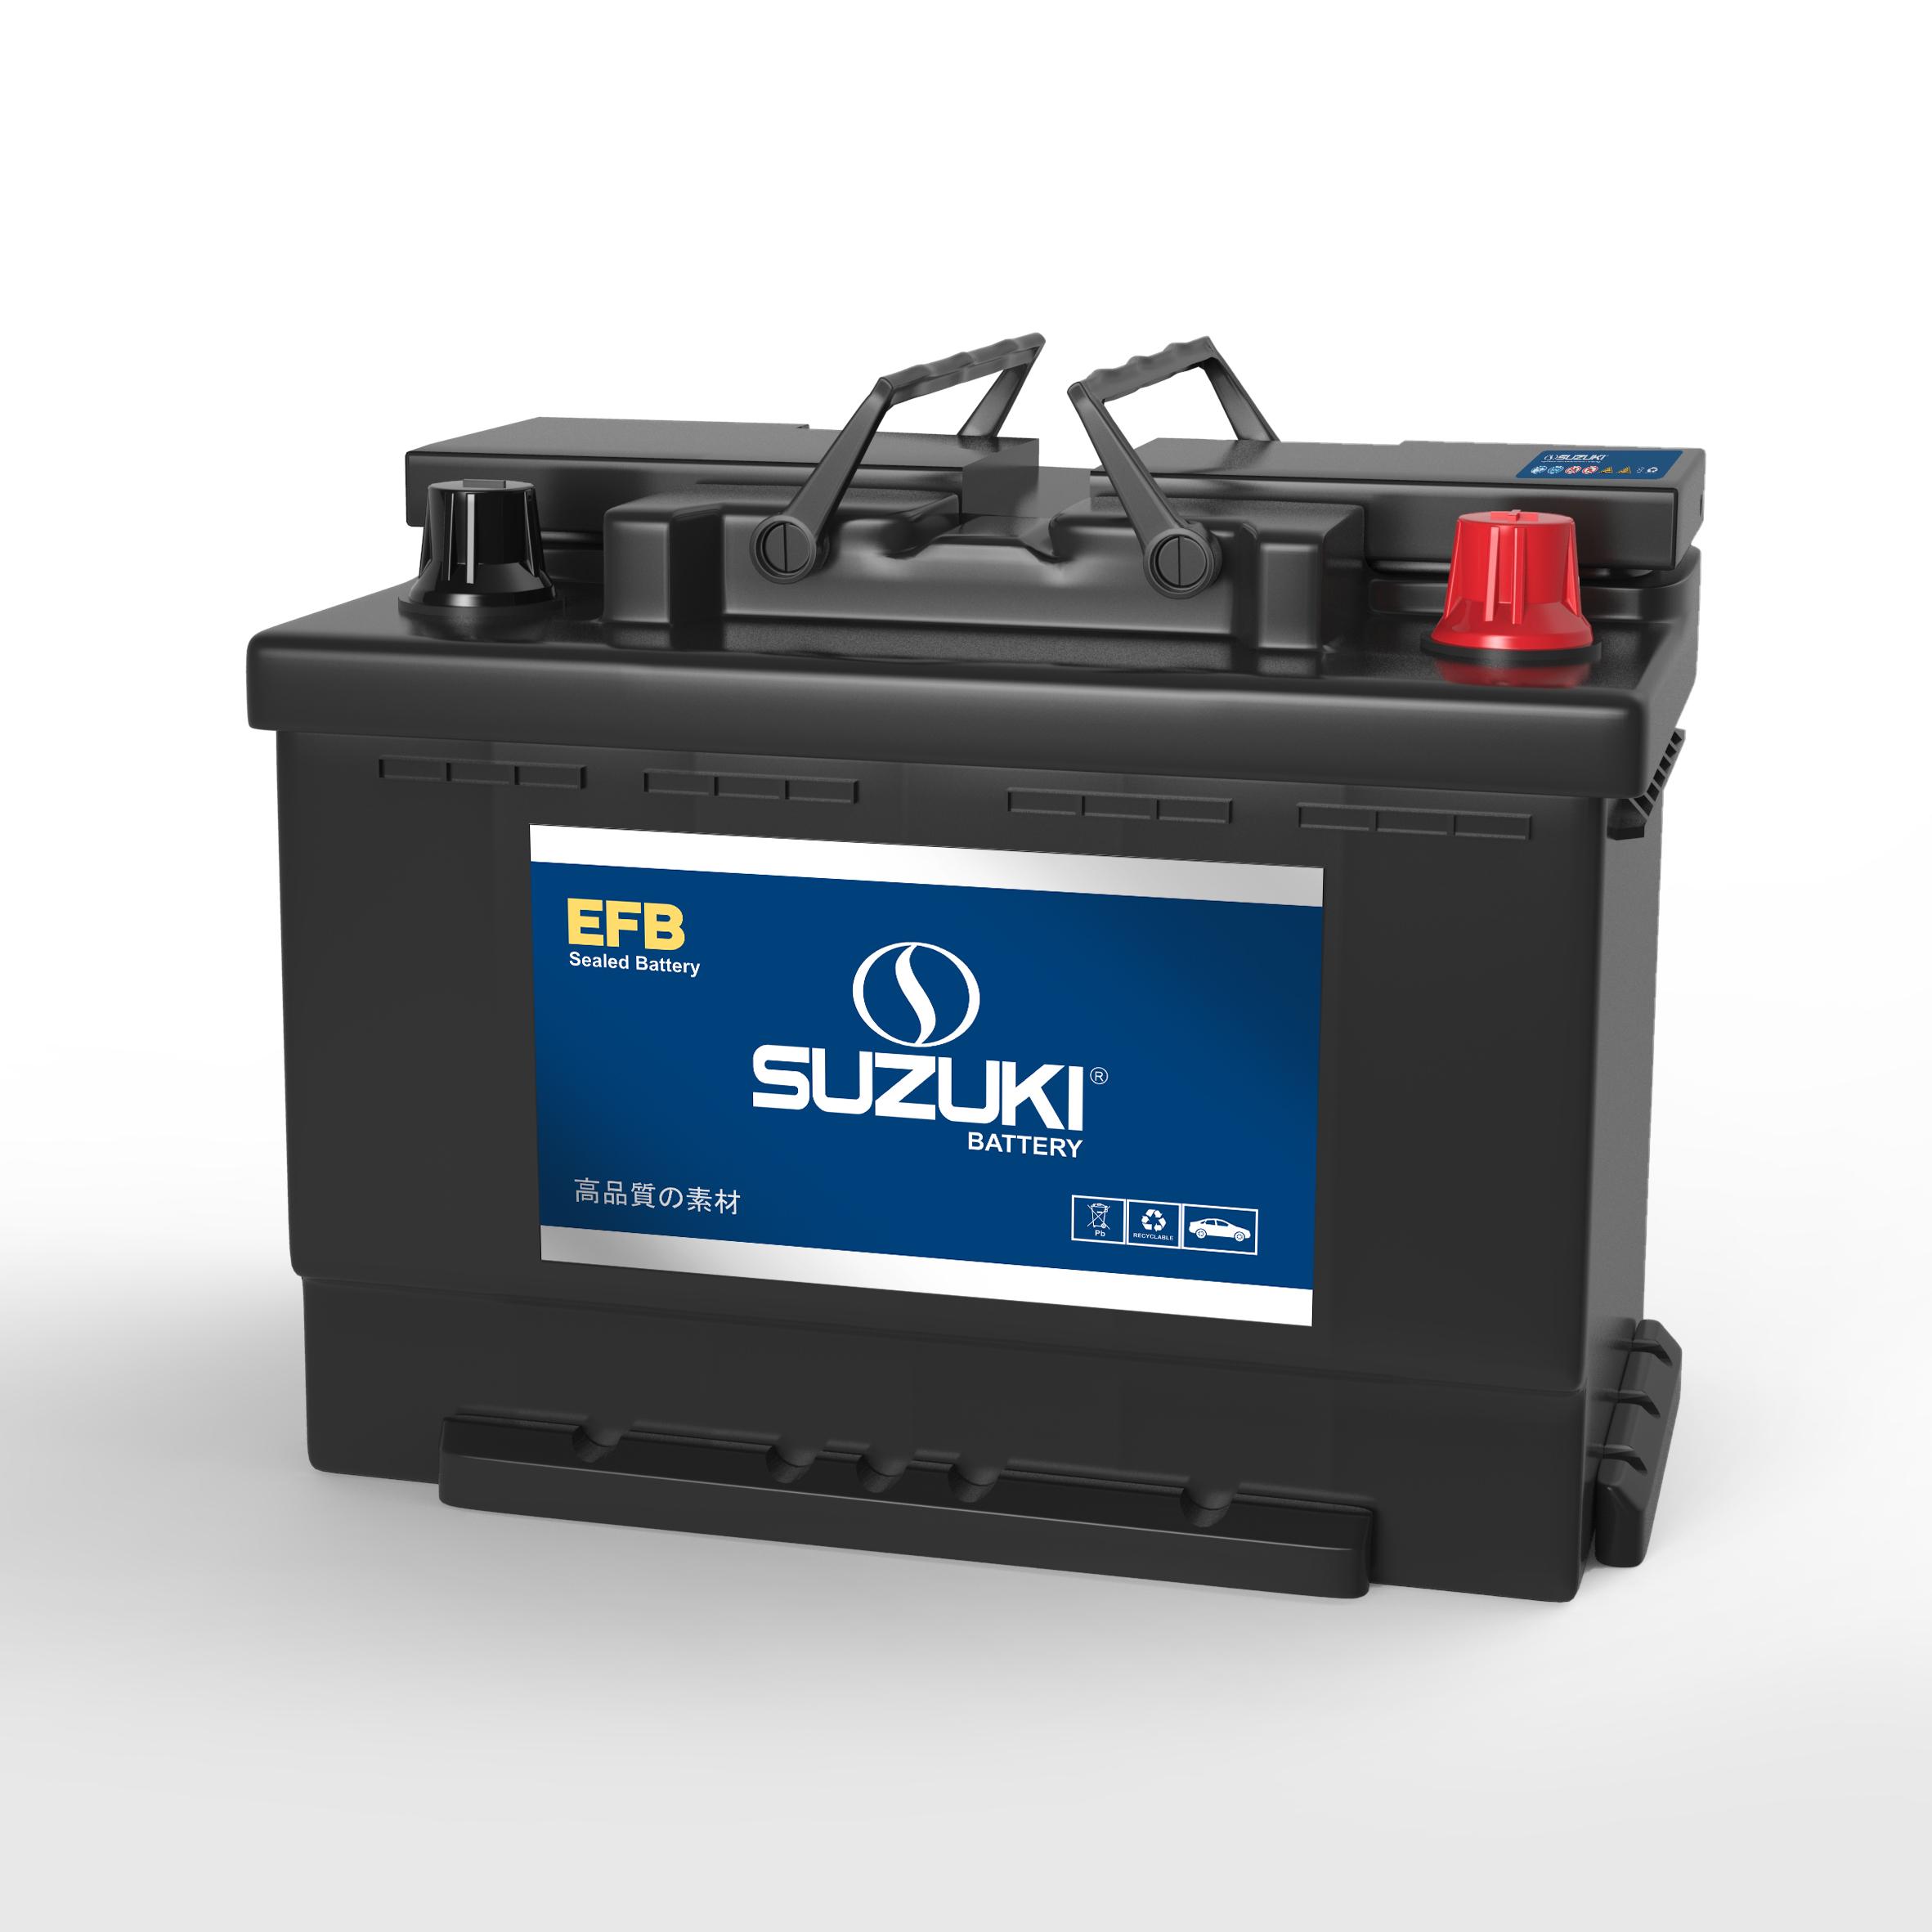 Suzuki EFB Batteries series